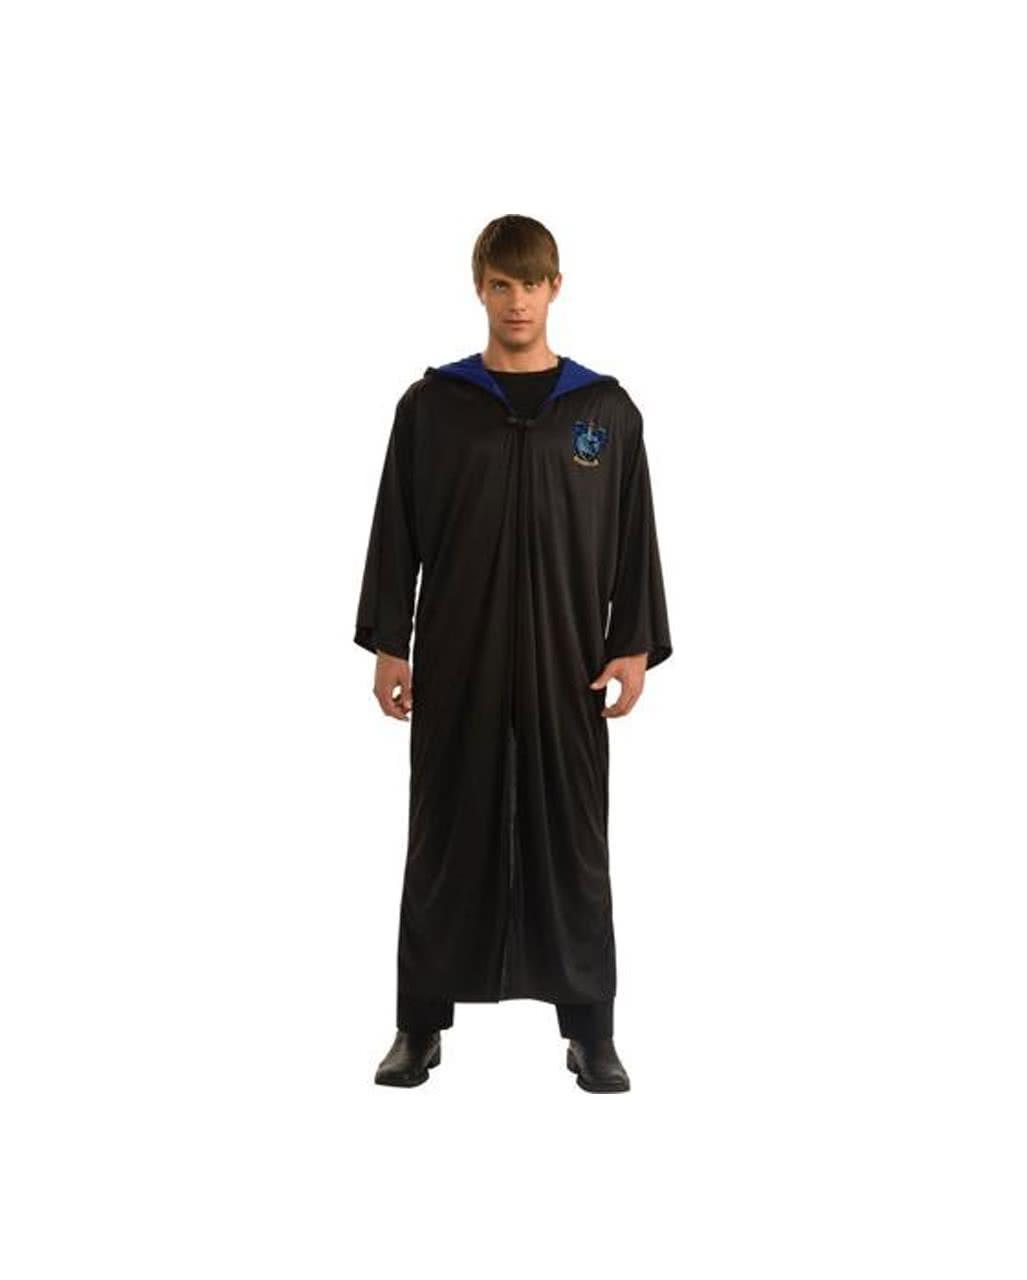 harry potter ravenclaw robe f r erwachsene f r halloween. Black Bedroom Furniture Sets. Home Design Ideas